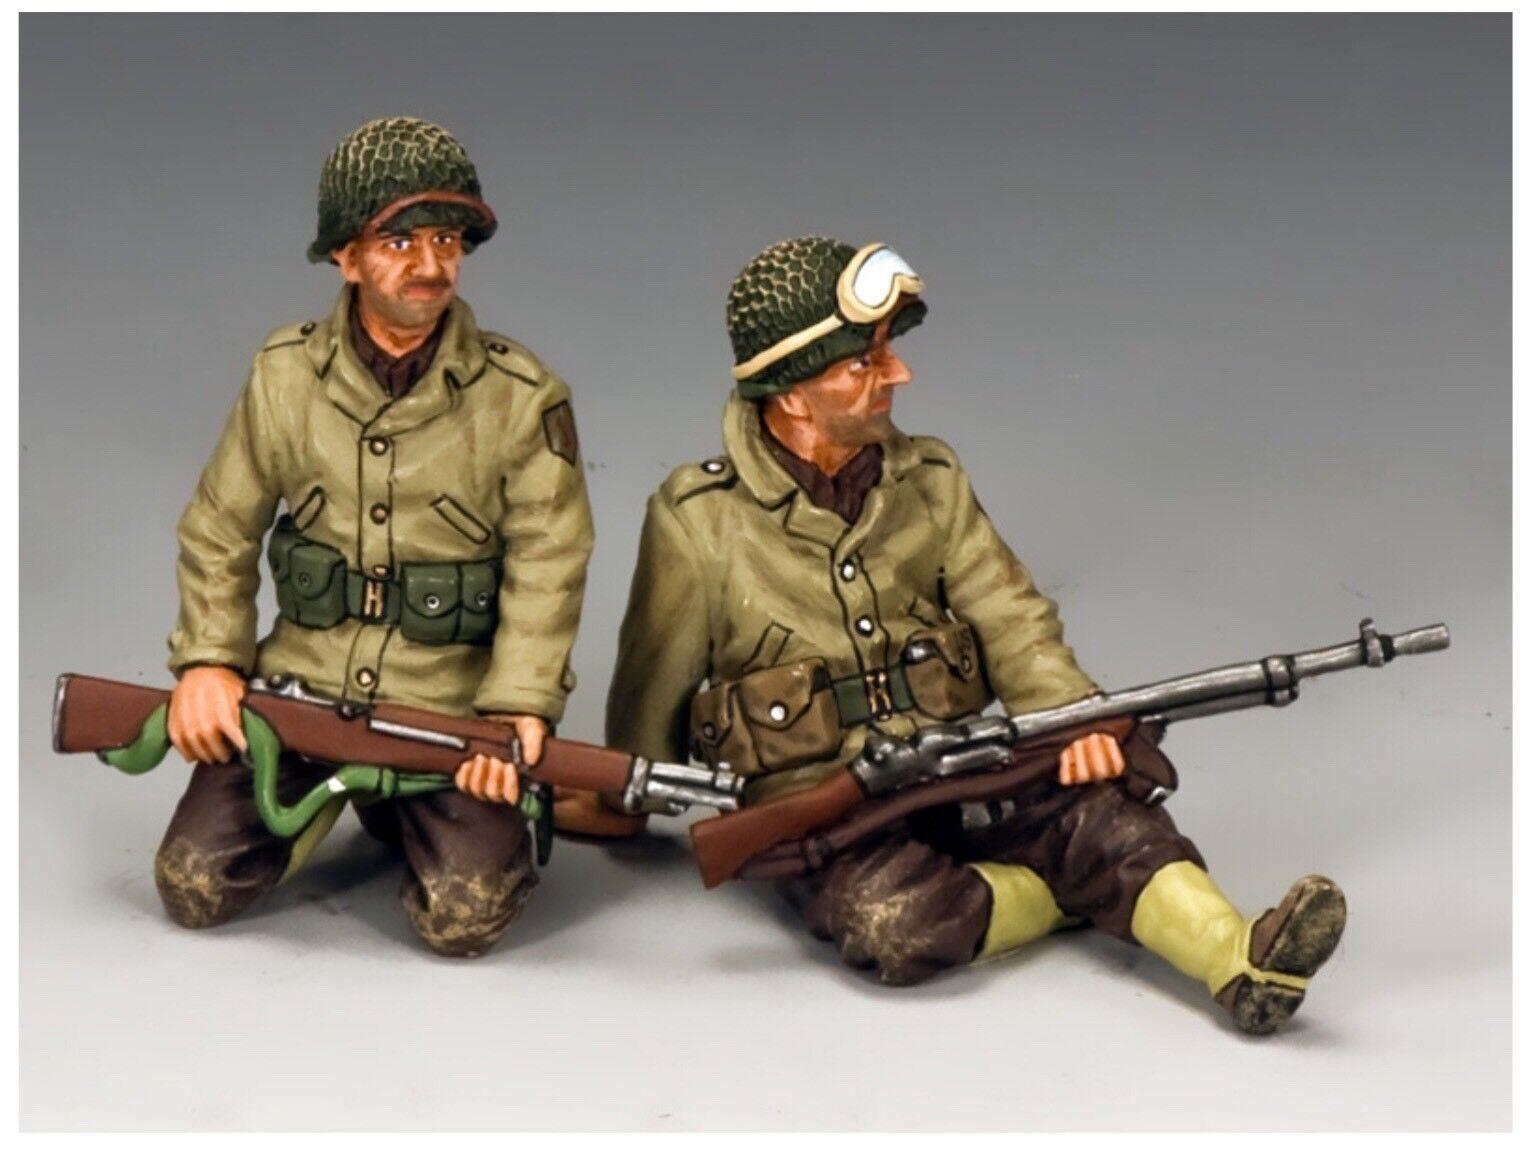 DD229 American WW2 US Army Tank Tank Riders Set  2 D Day Normandy Mint In Box DD 229